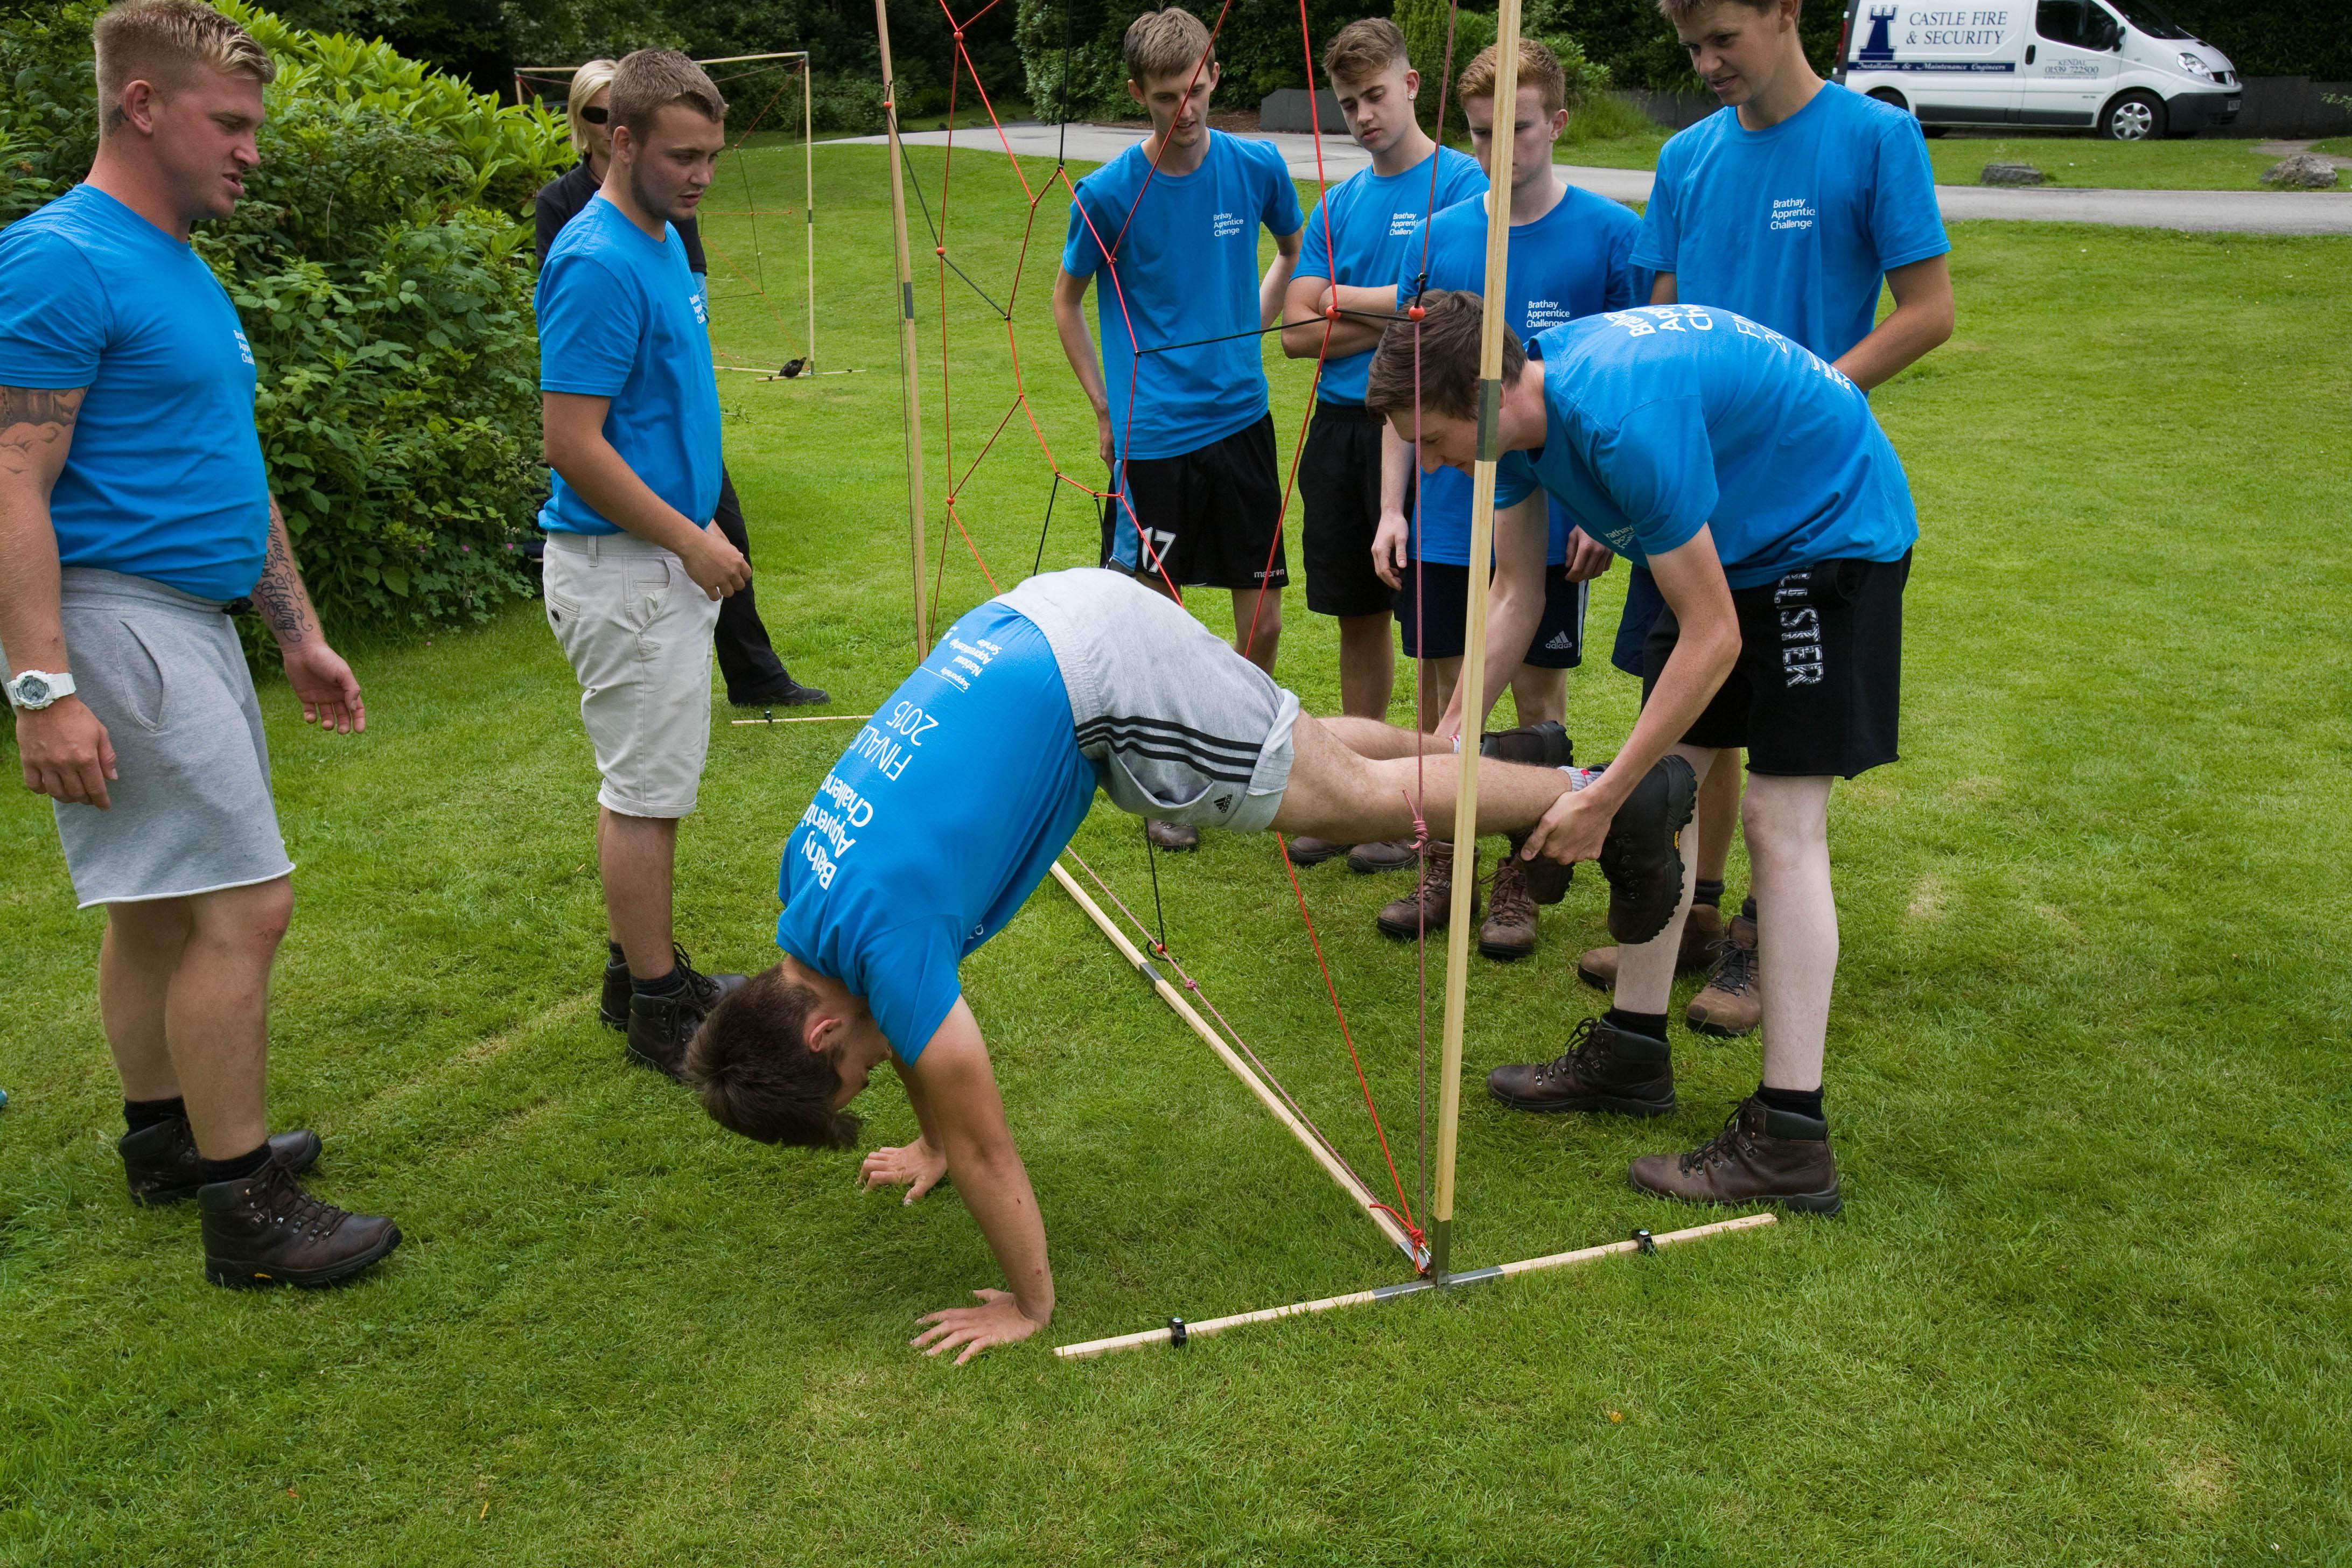 Team Redrow Homes apprentices